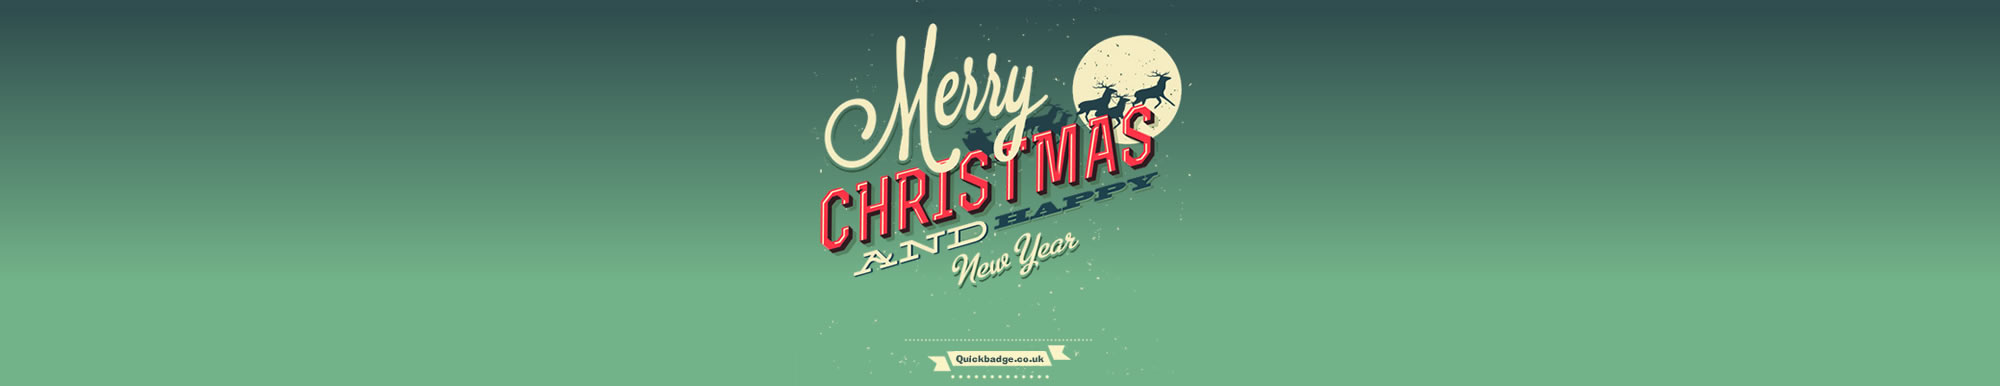 Quickbadge-Christmas